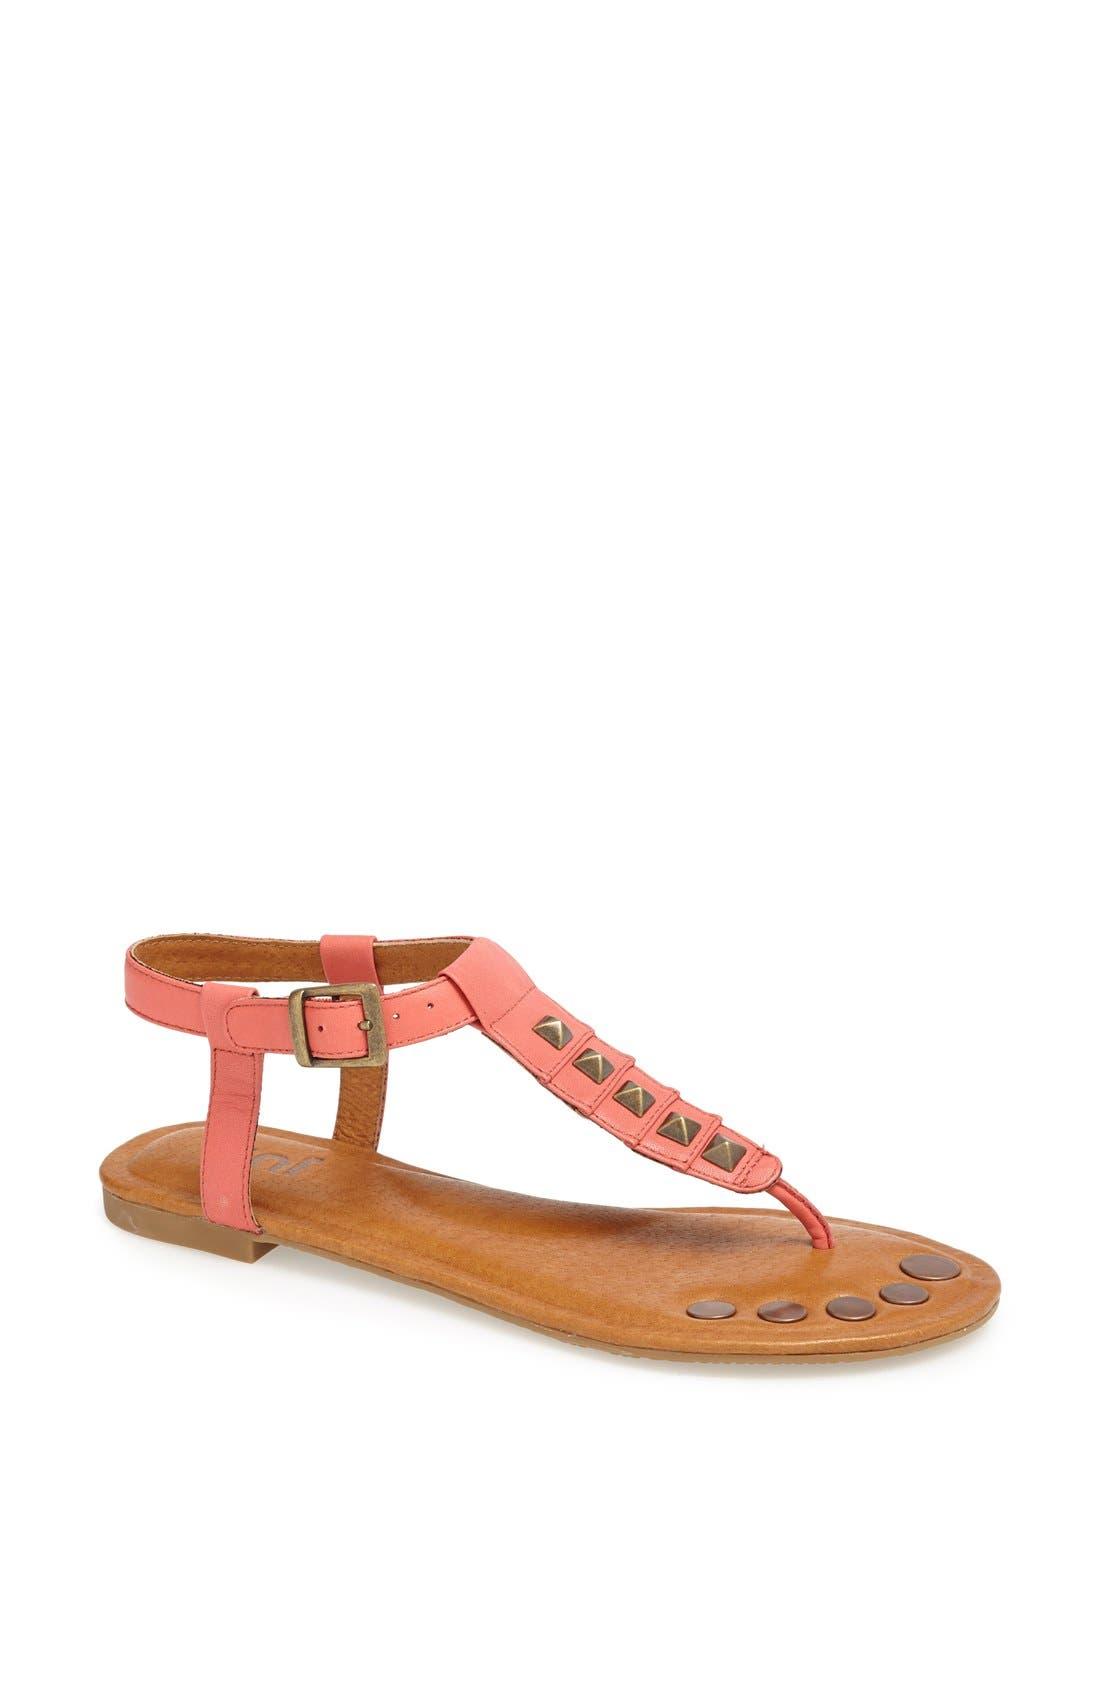 Alternate Image 1 Selected - Juil 'Kava' Grounded Leather Sandal